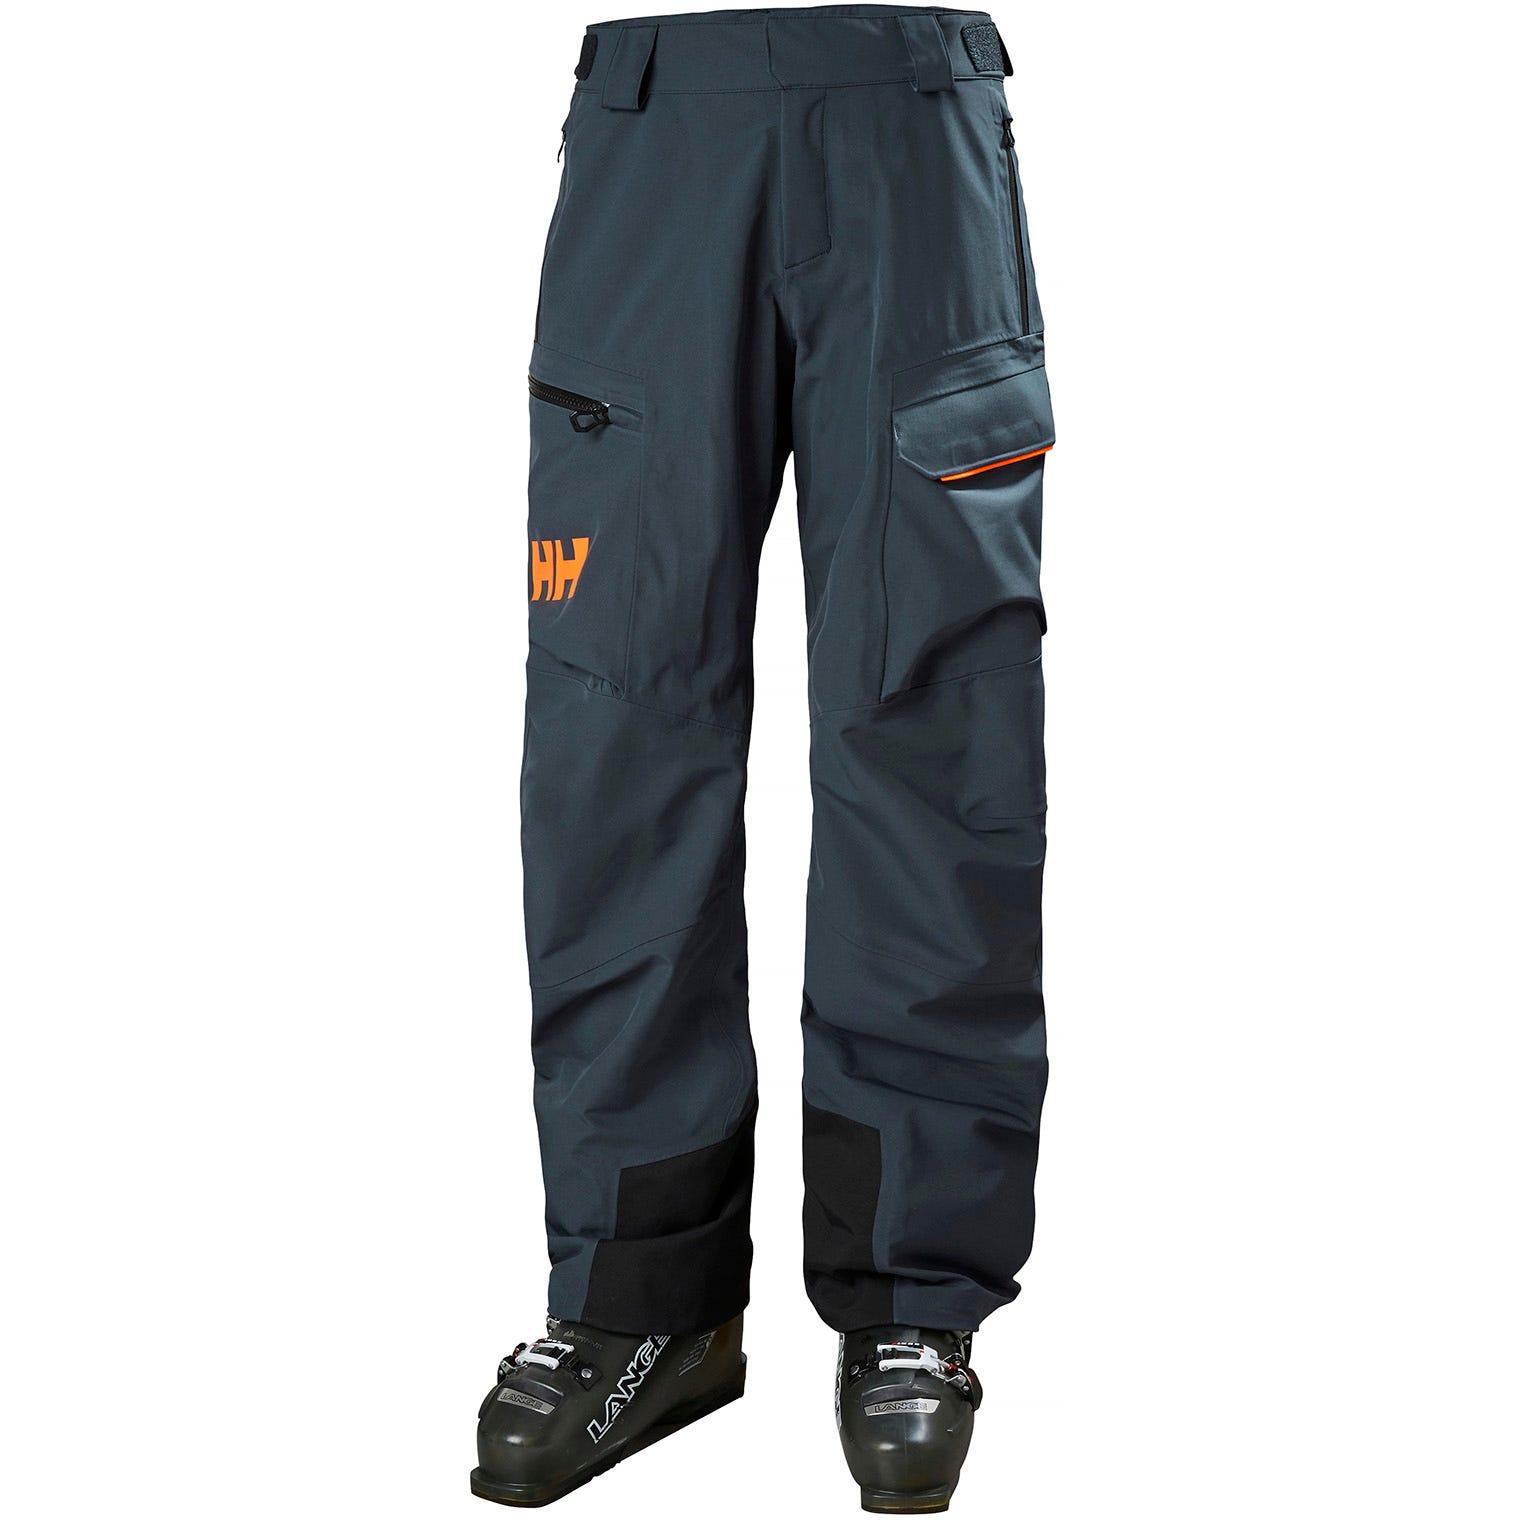 Helly Hansen Mens Ridge Shell Durable Ski Trousers Grey XL